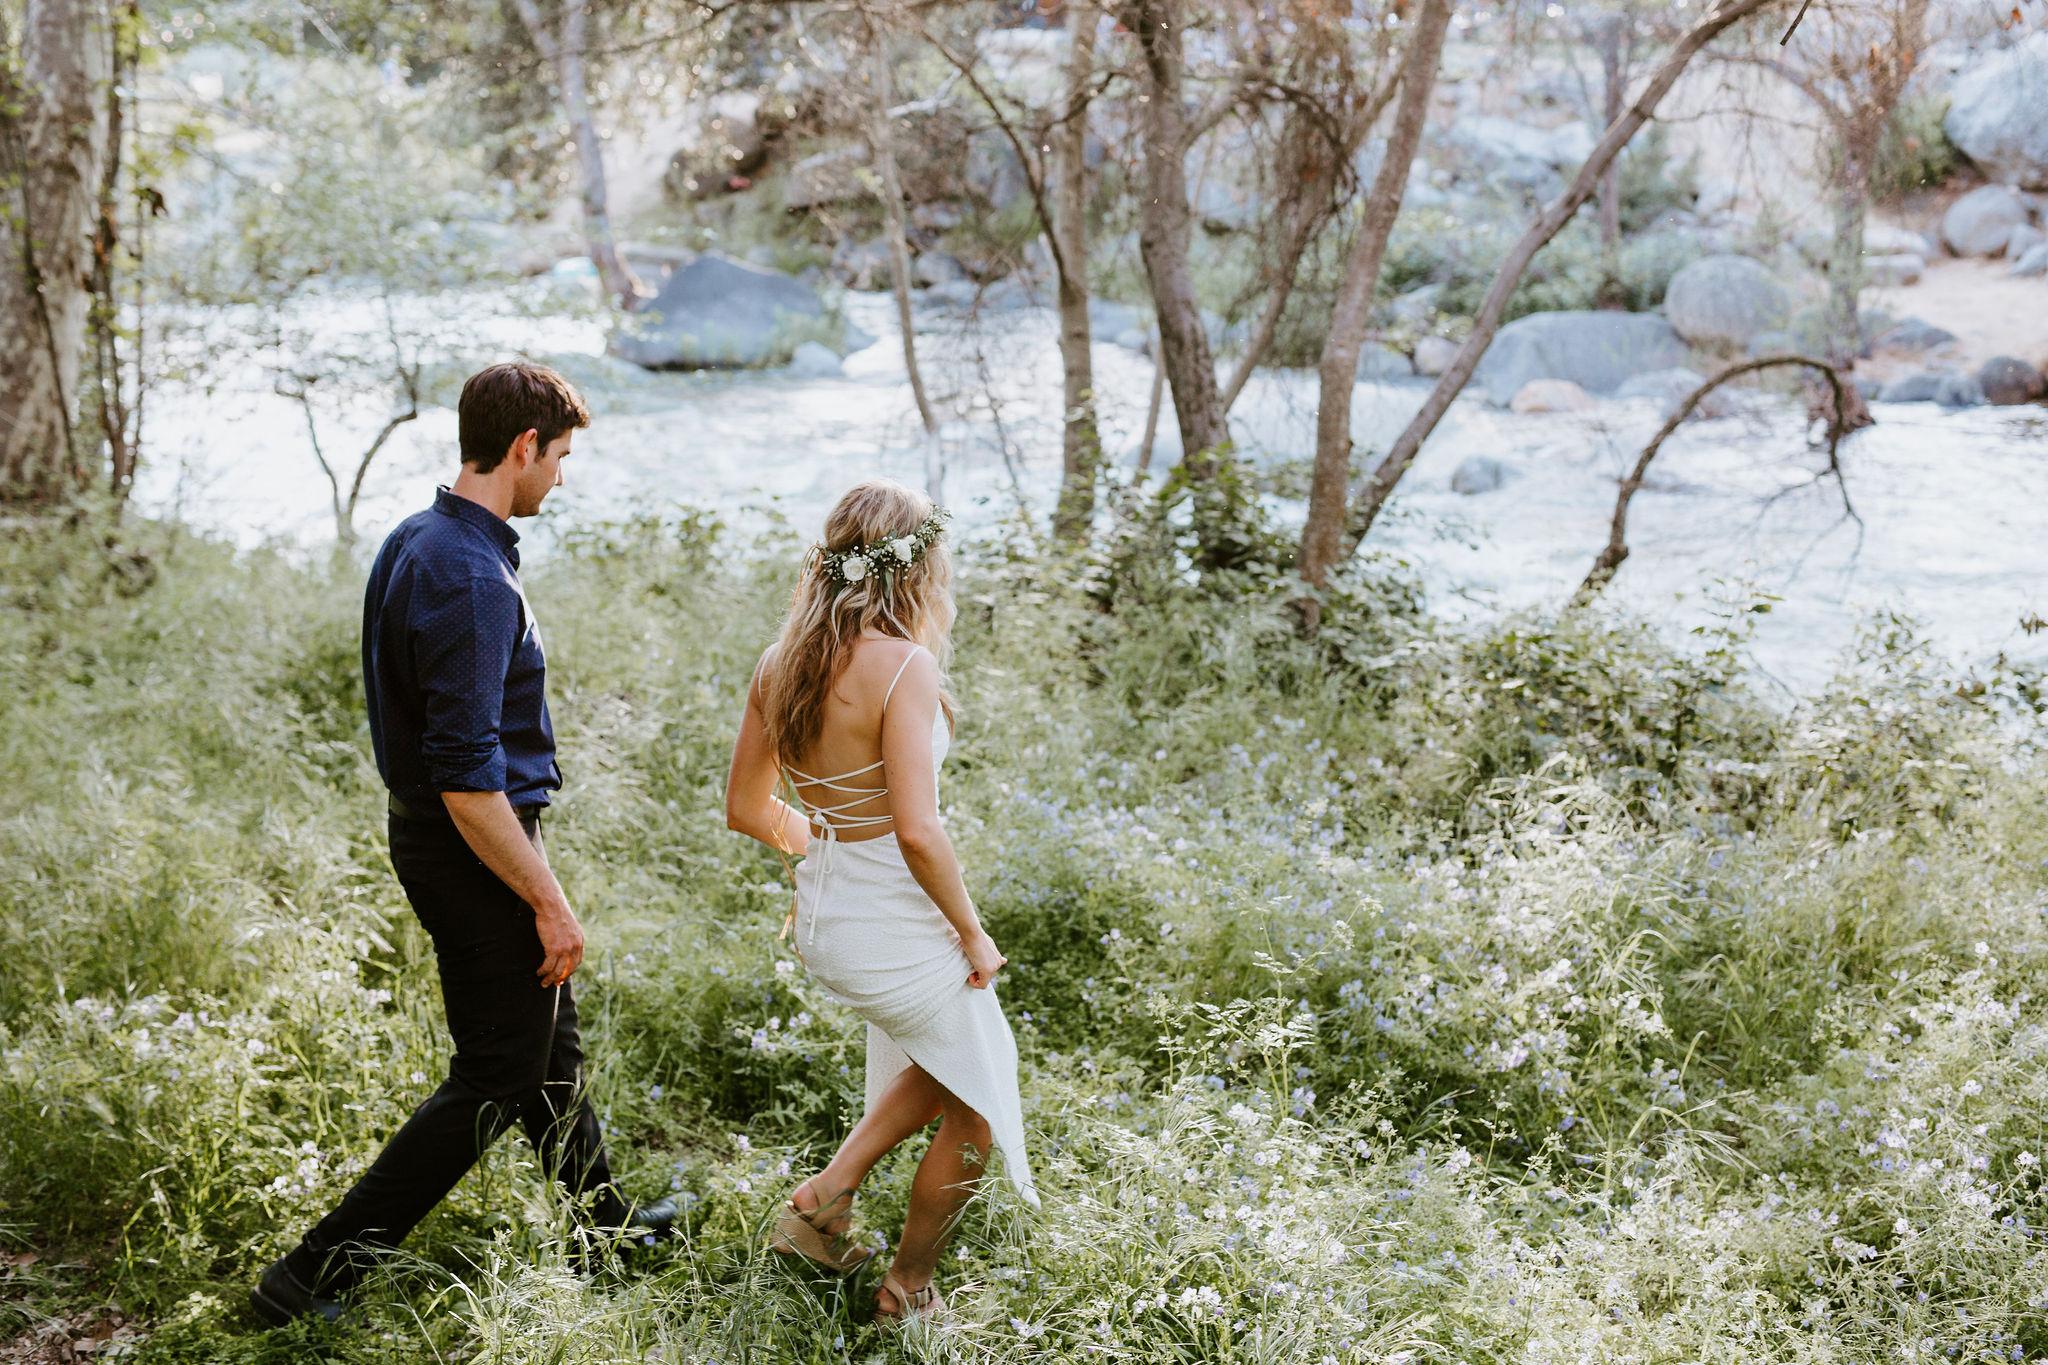 RedwoodRanch_Geoff&LyndsiPhotography_Mike&Amanda_Romantics37.jpg